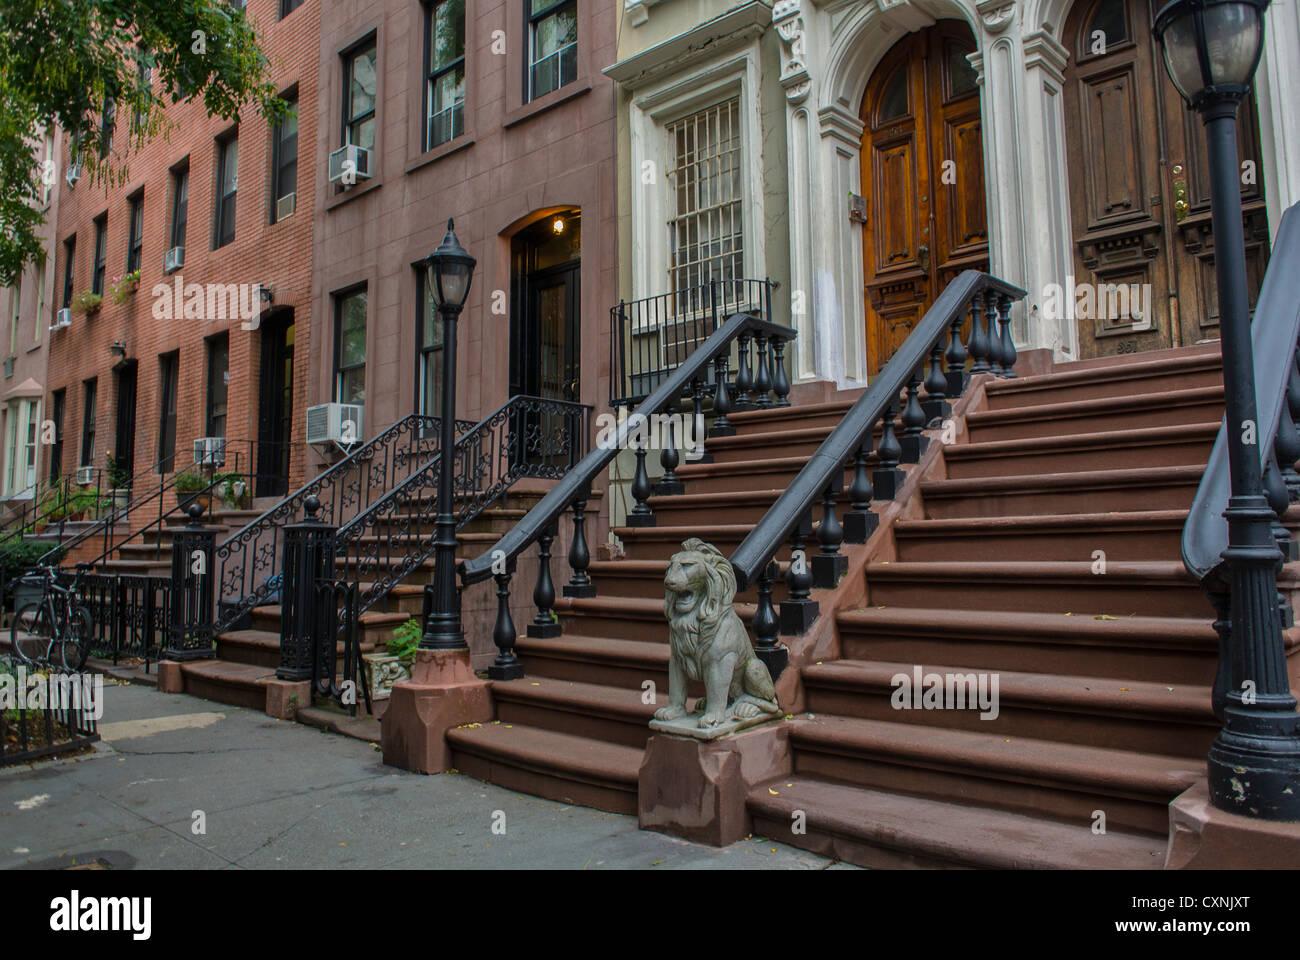 new york  ny  usa  historic row houses  brownstone  holiday apartment new york city manhattan